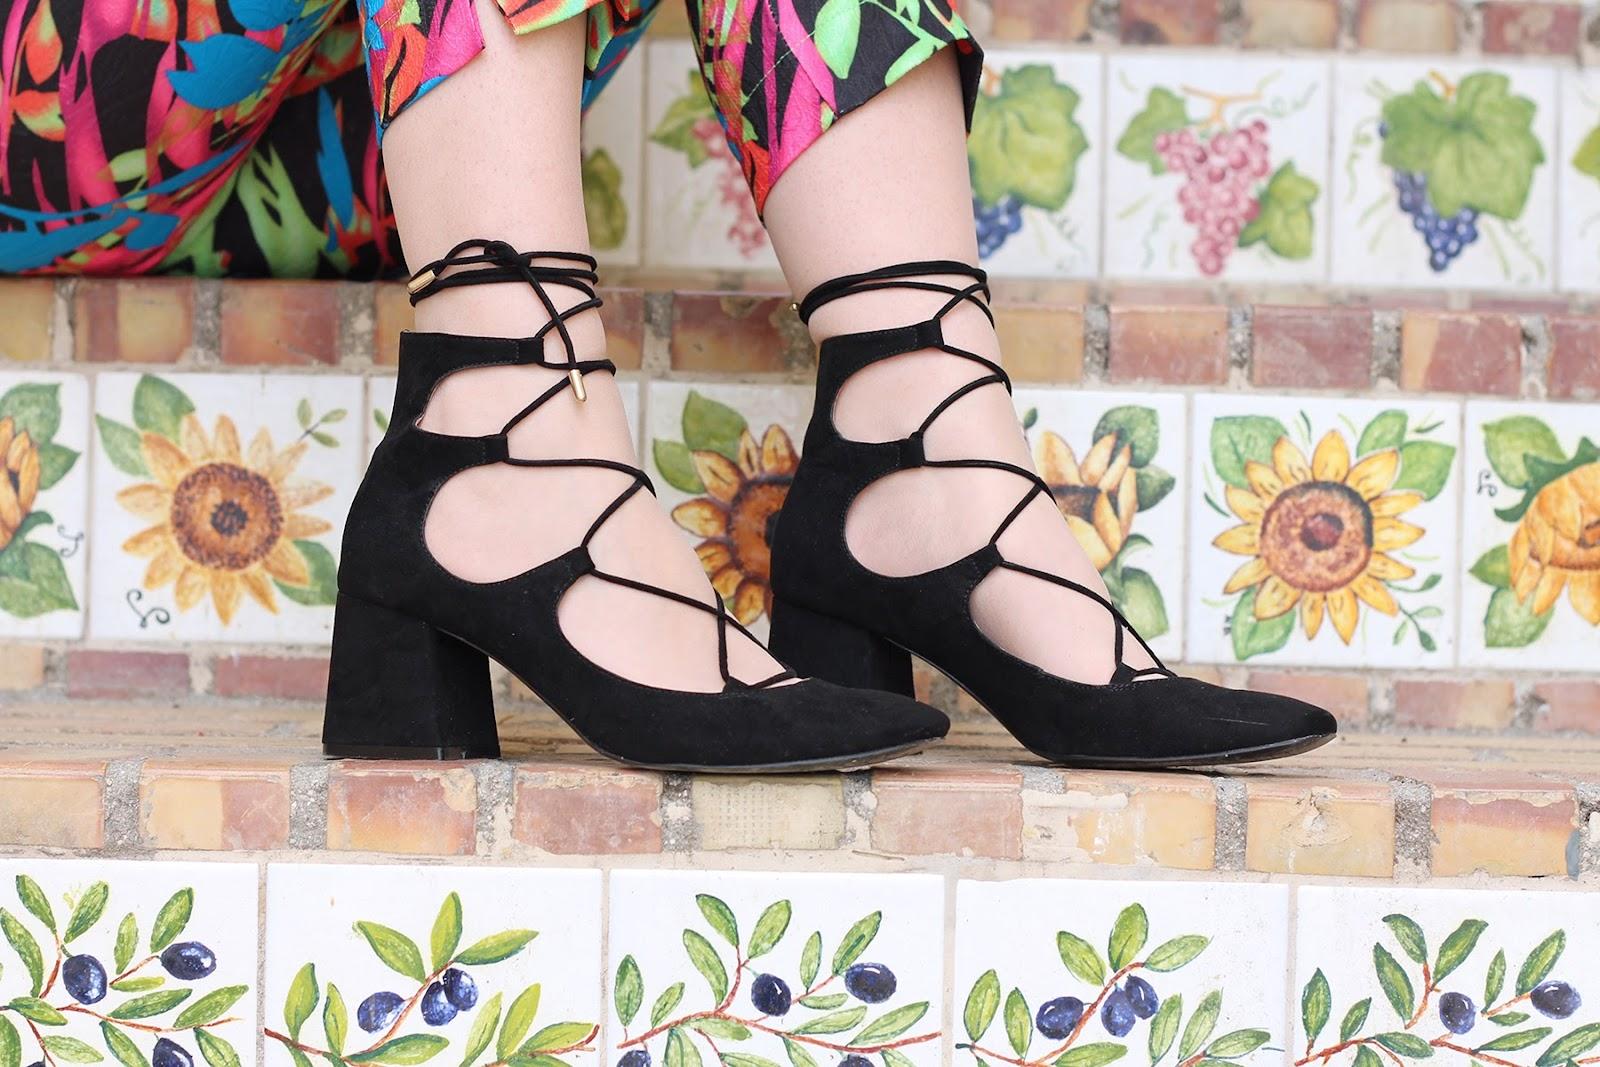 fashion style blogger italian girl italy vogue glamour pescara vasto goa goa pant colors zara heels sandals shoes scarpe